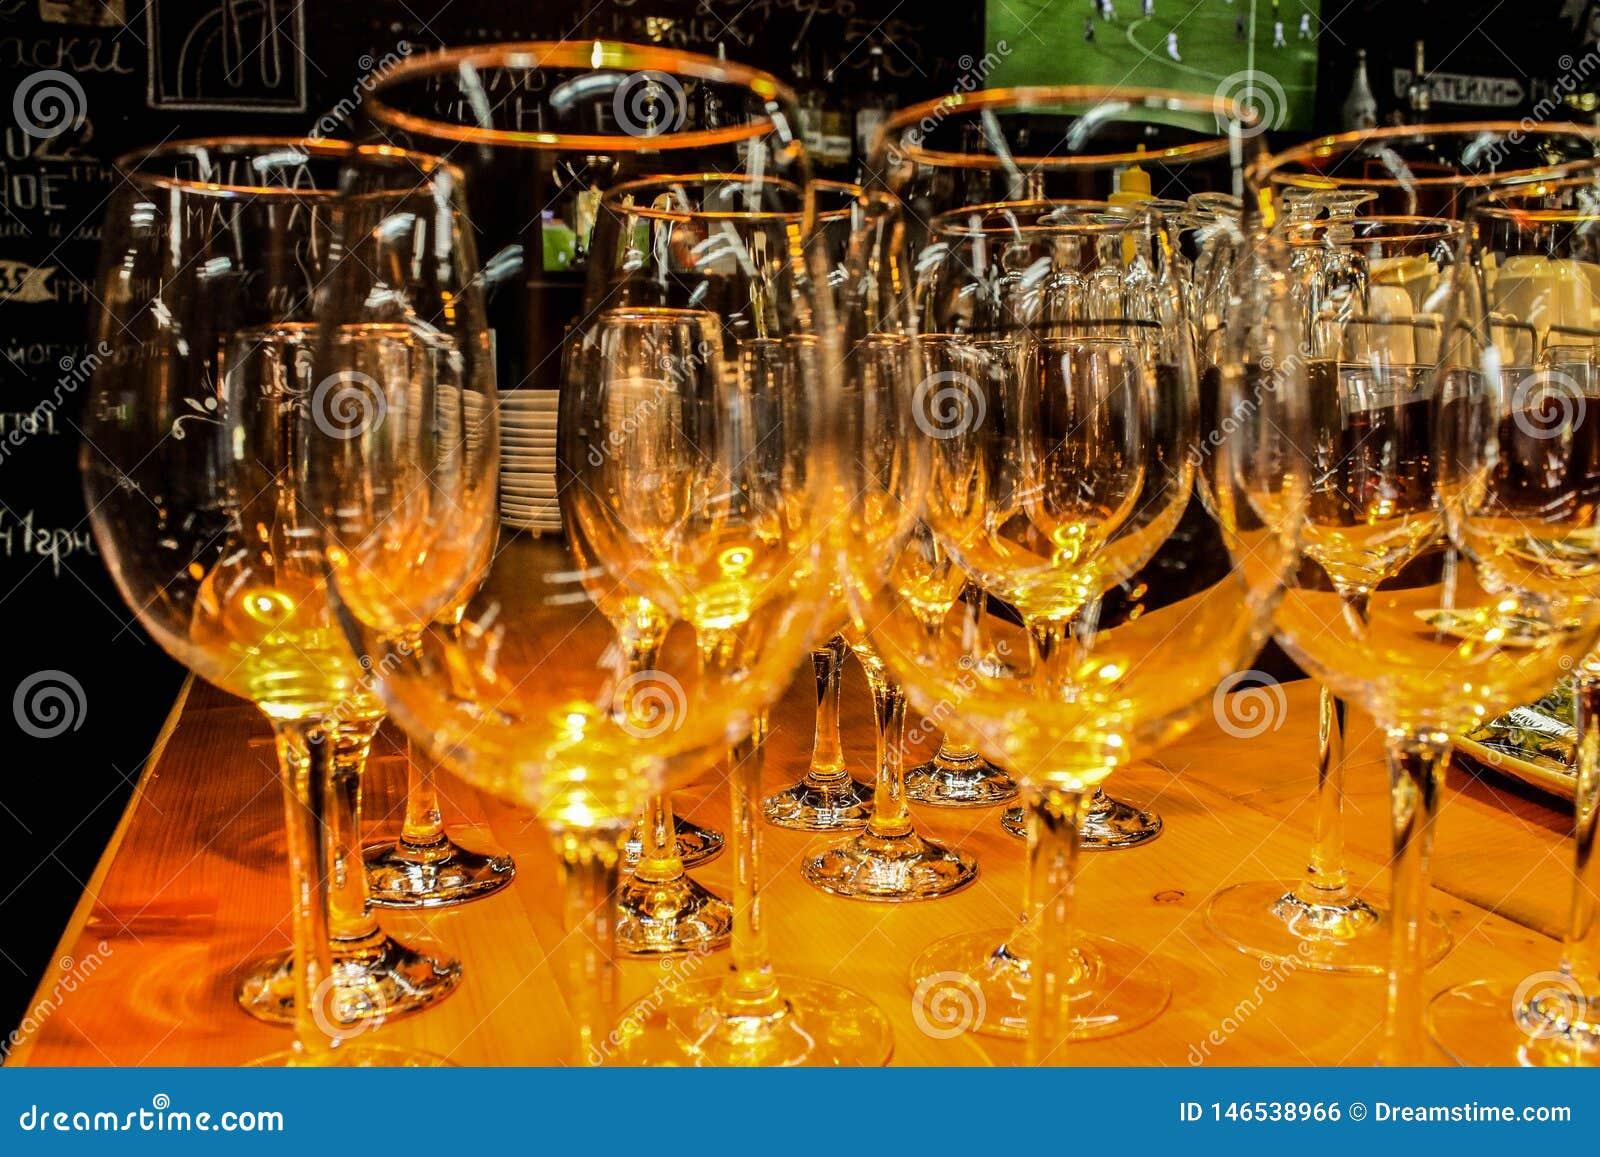 WOW! So nice wineglasses